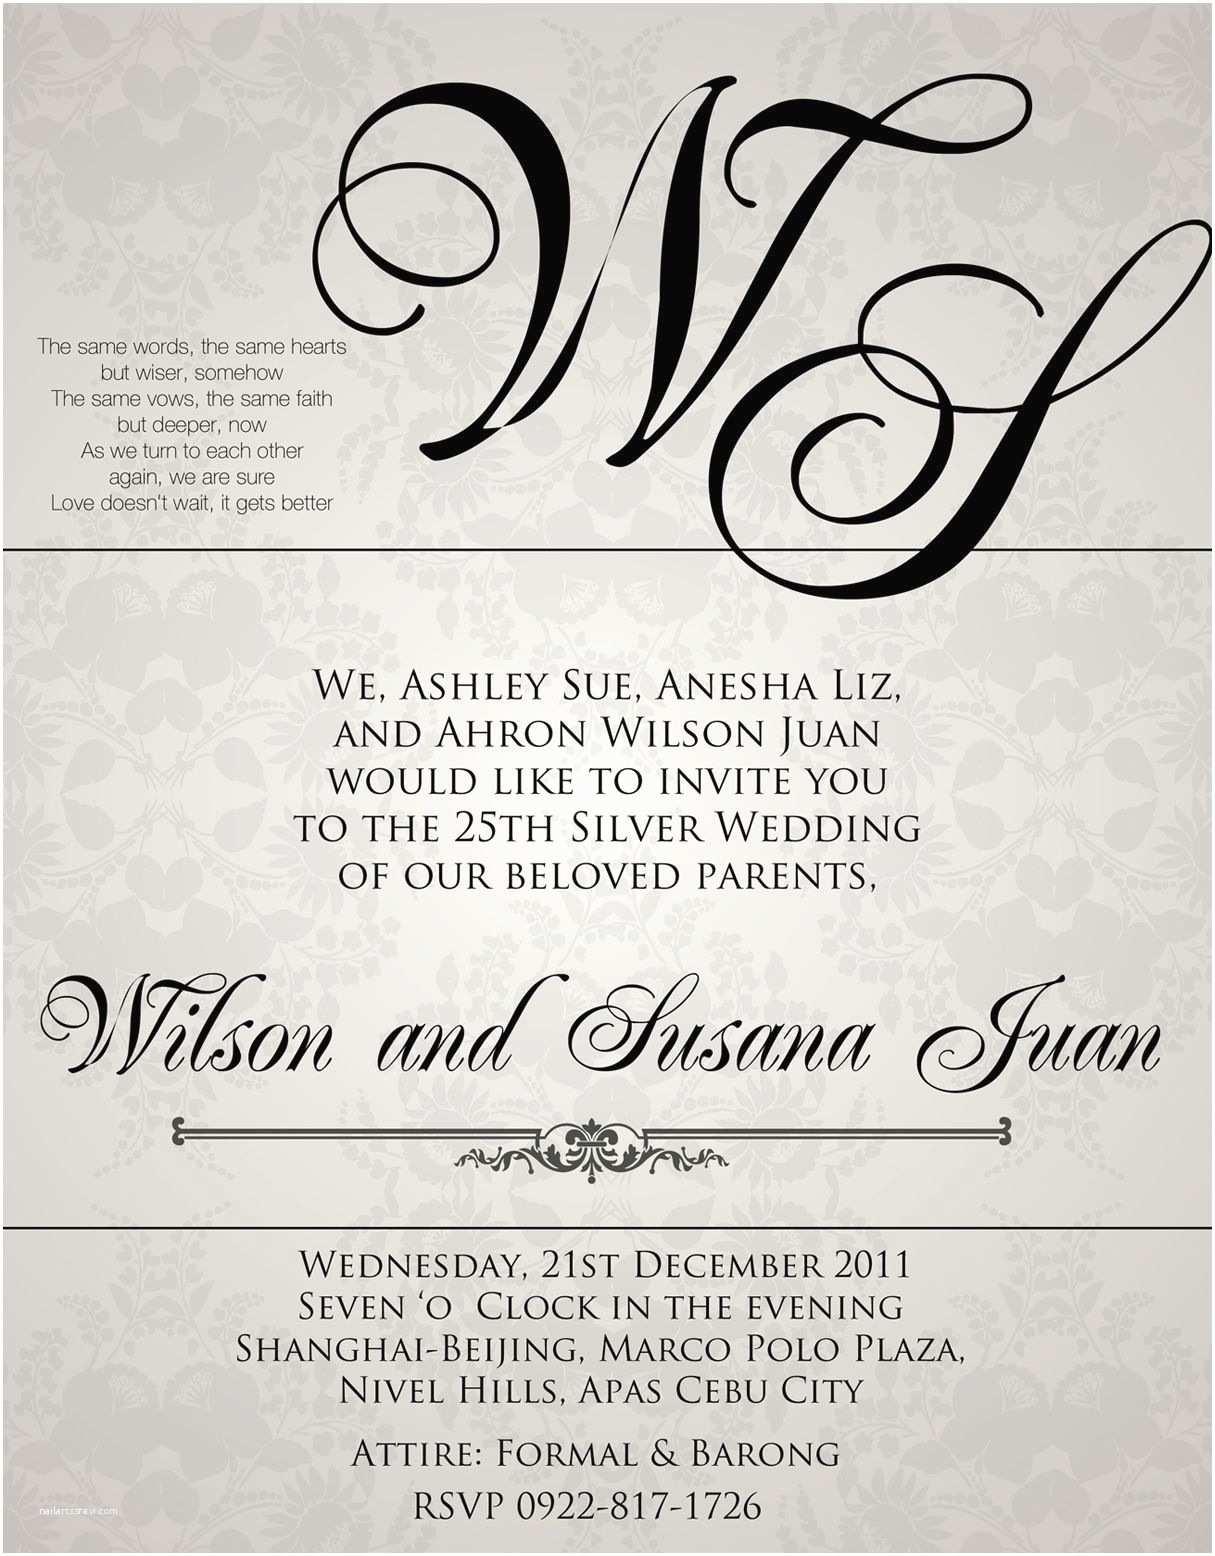 Wedding Invitation Wording Samples Sample Wedding Invitation Wording In the Philippines